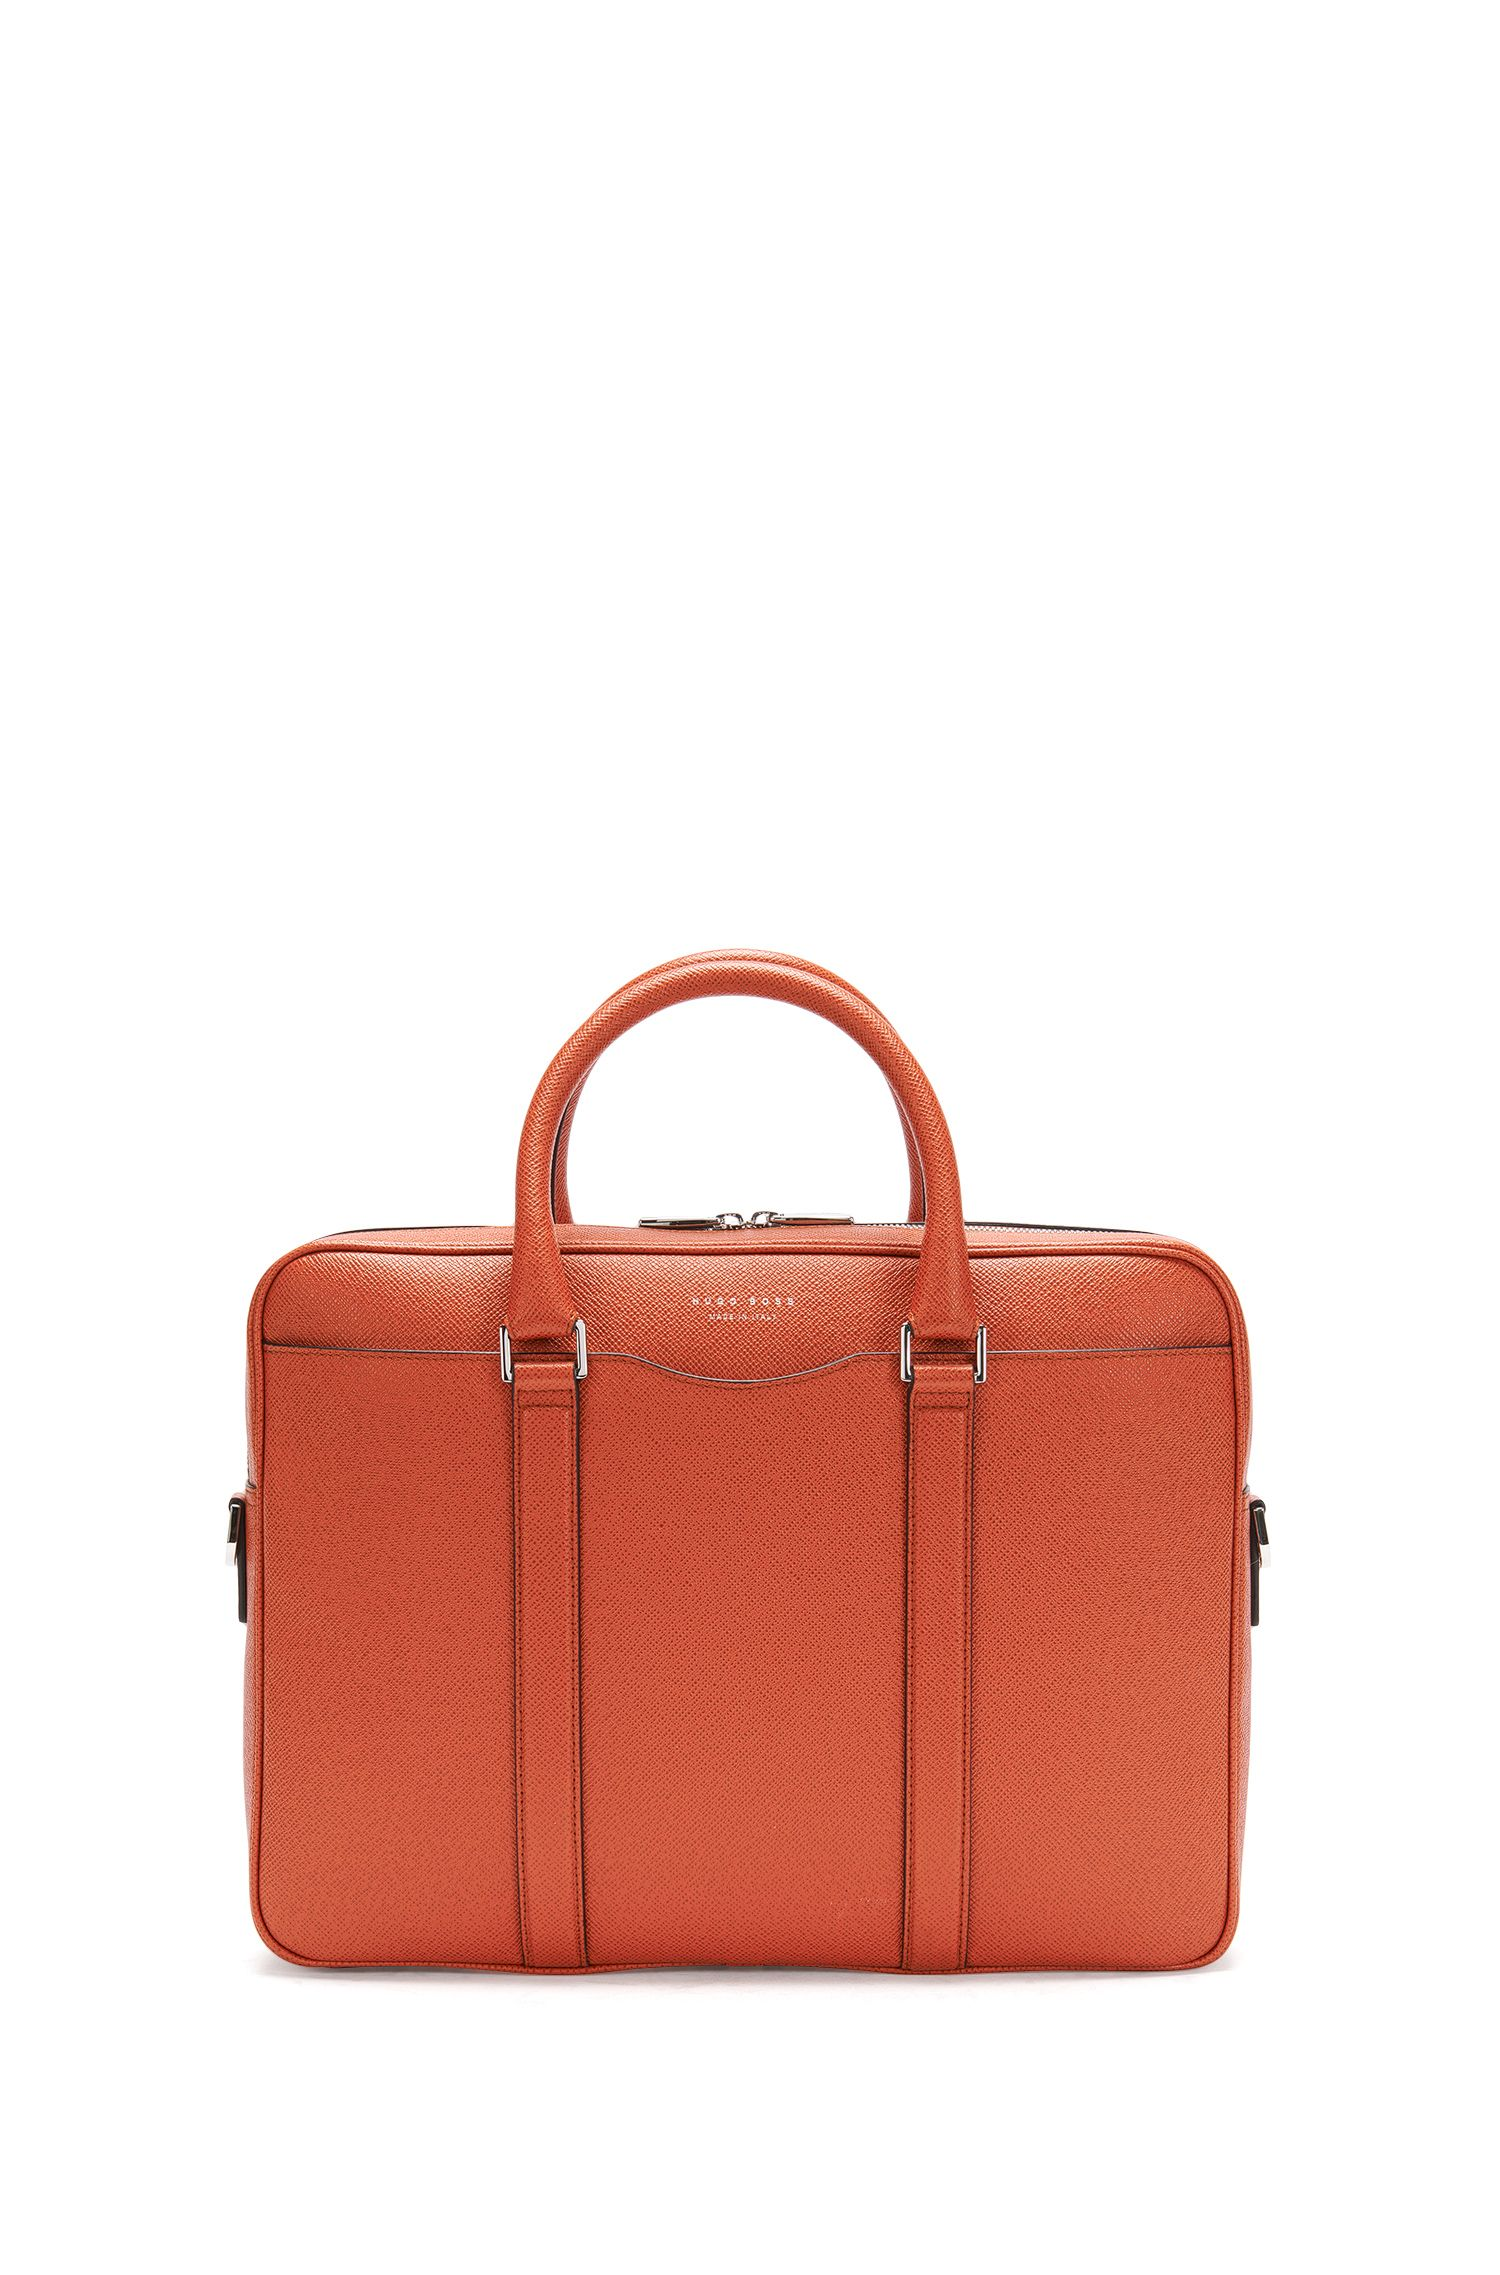 'Signature S Doc'   Italian Calfskin Workbag, Detachable Shoulder Strap